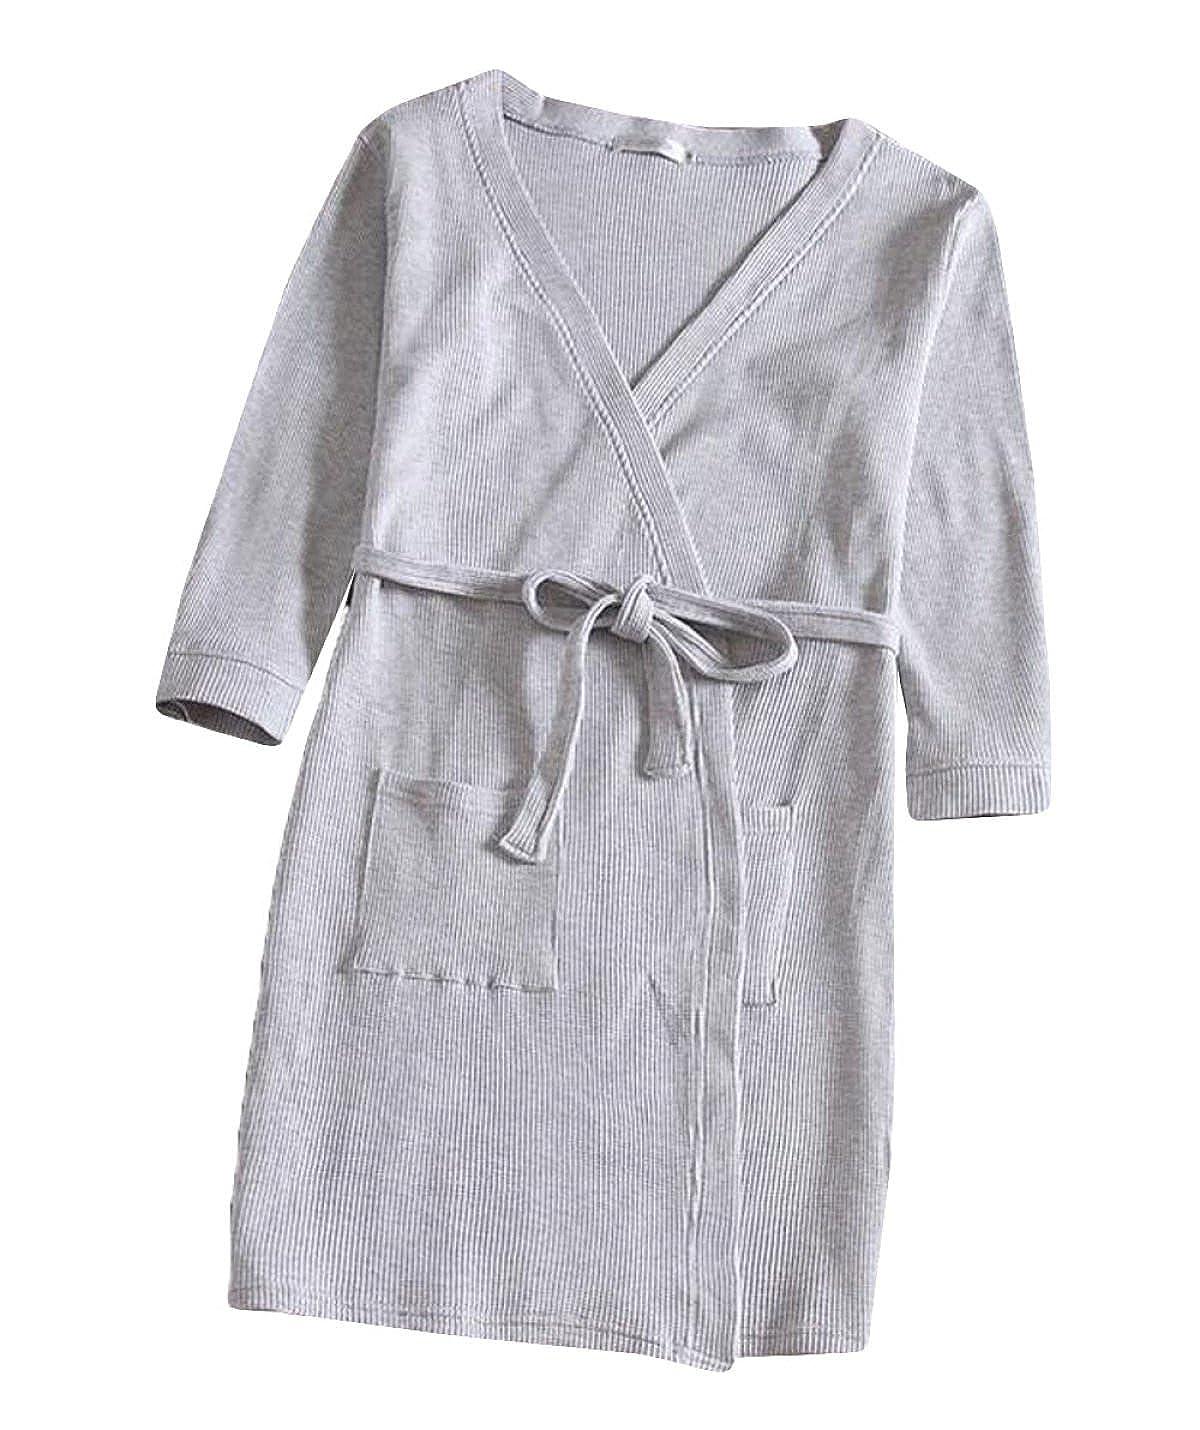 Men's Long-sleeved Bathrobes Cotton Robe PFSNR Ltd